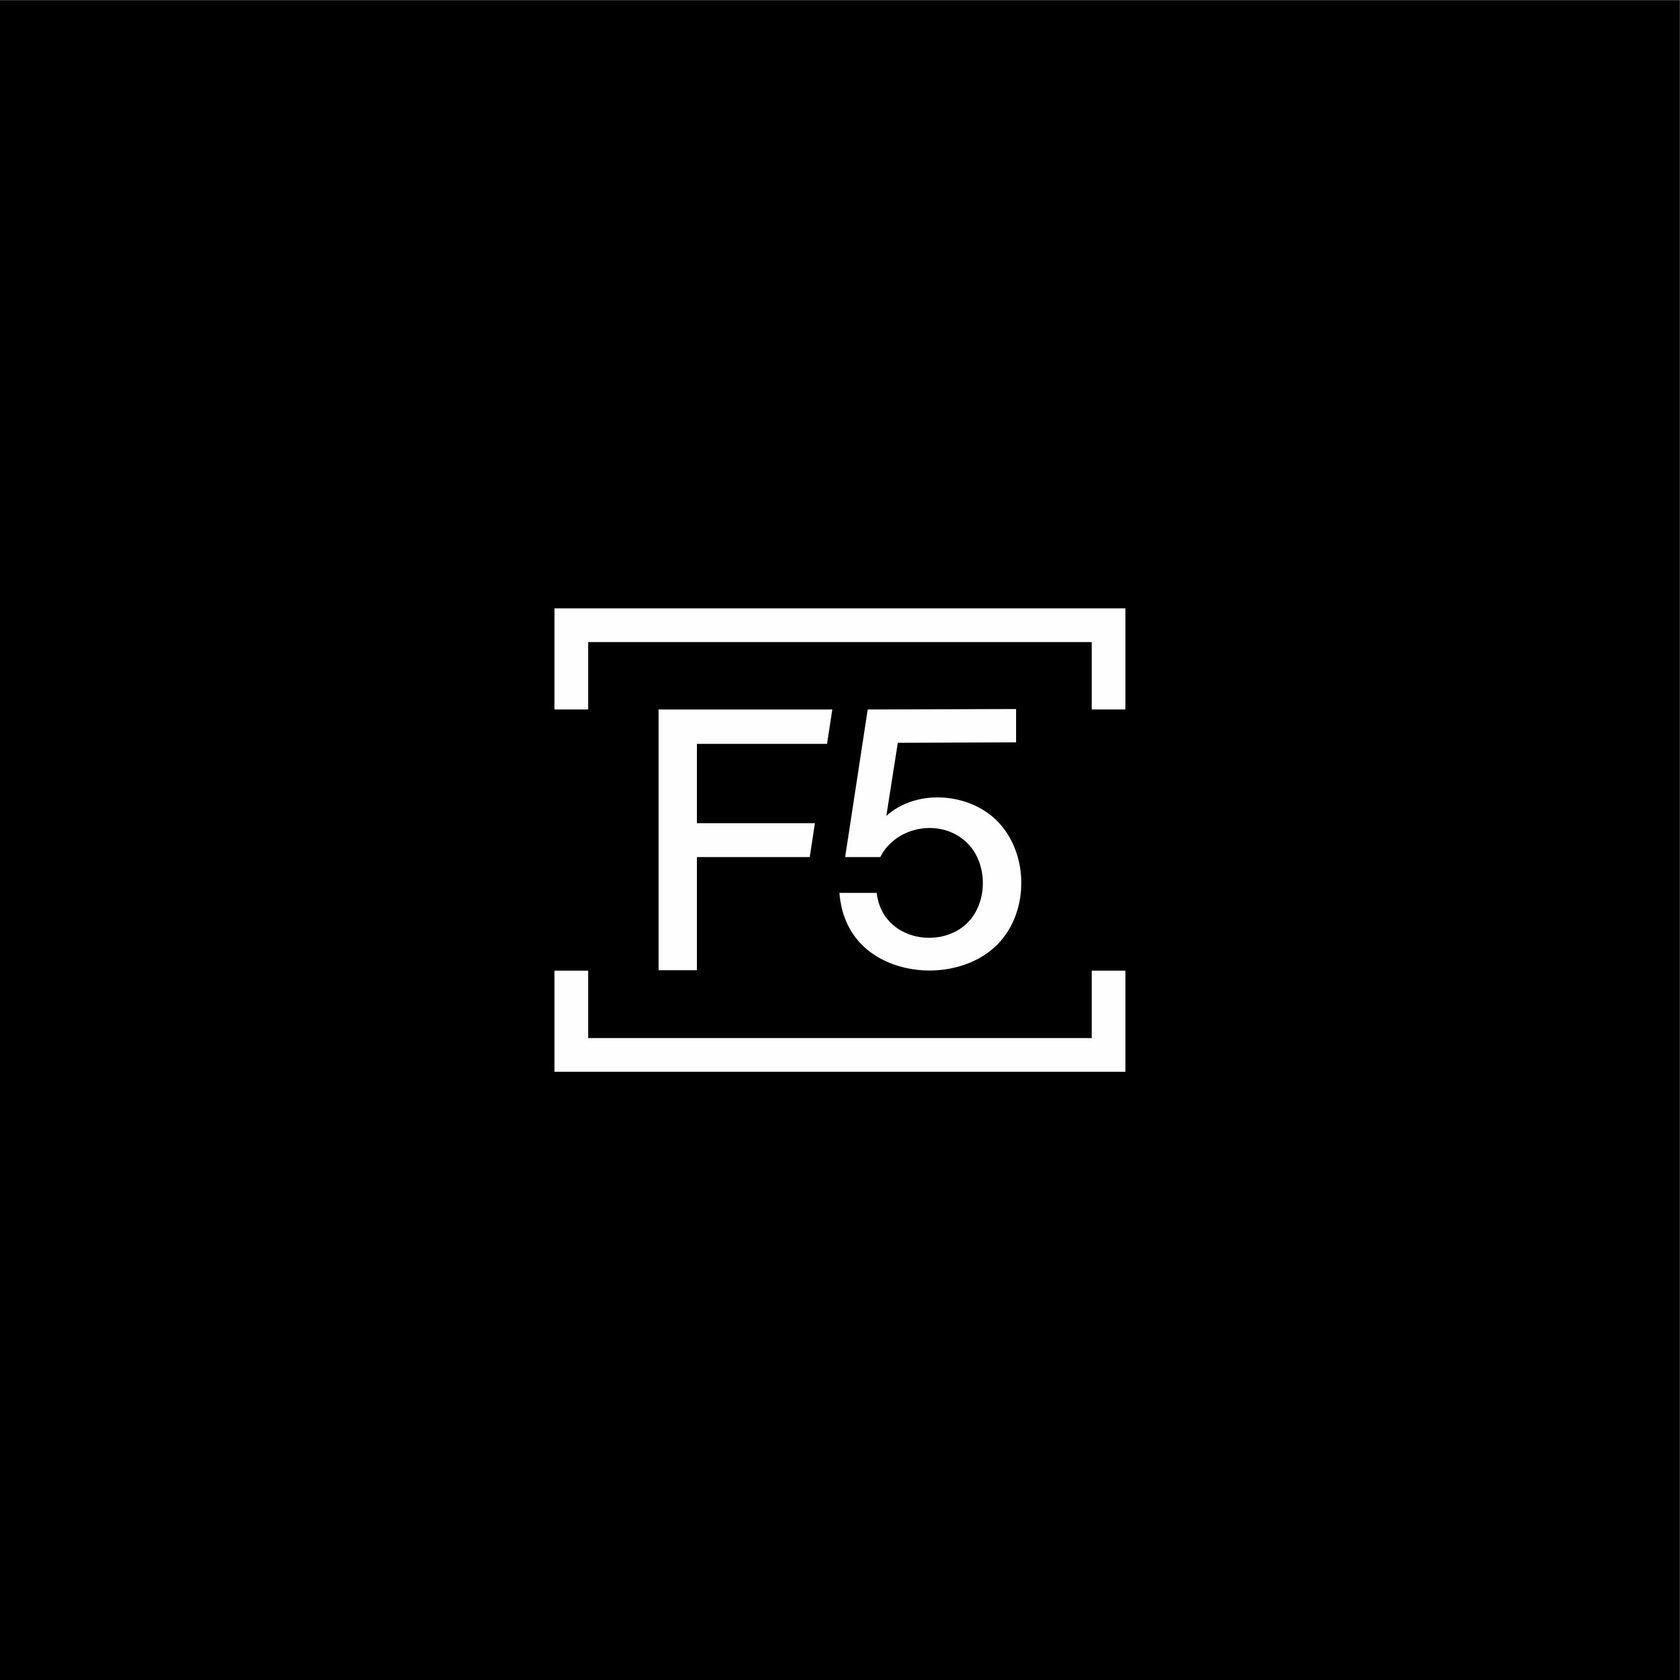 F5-DESIGN STUDIO